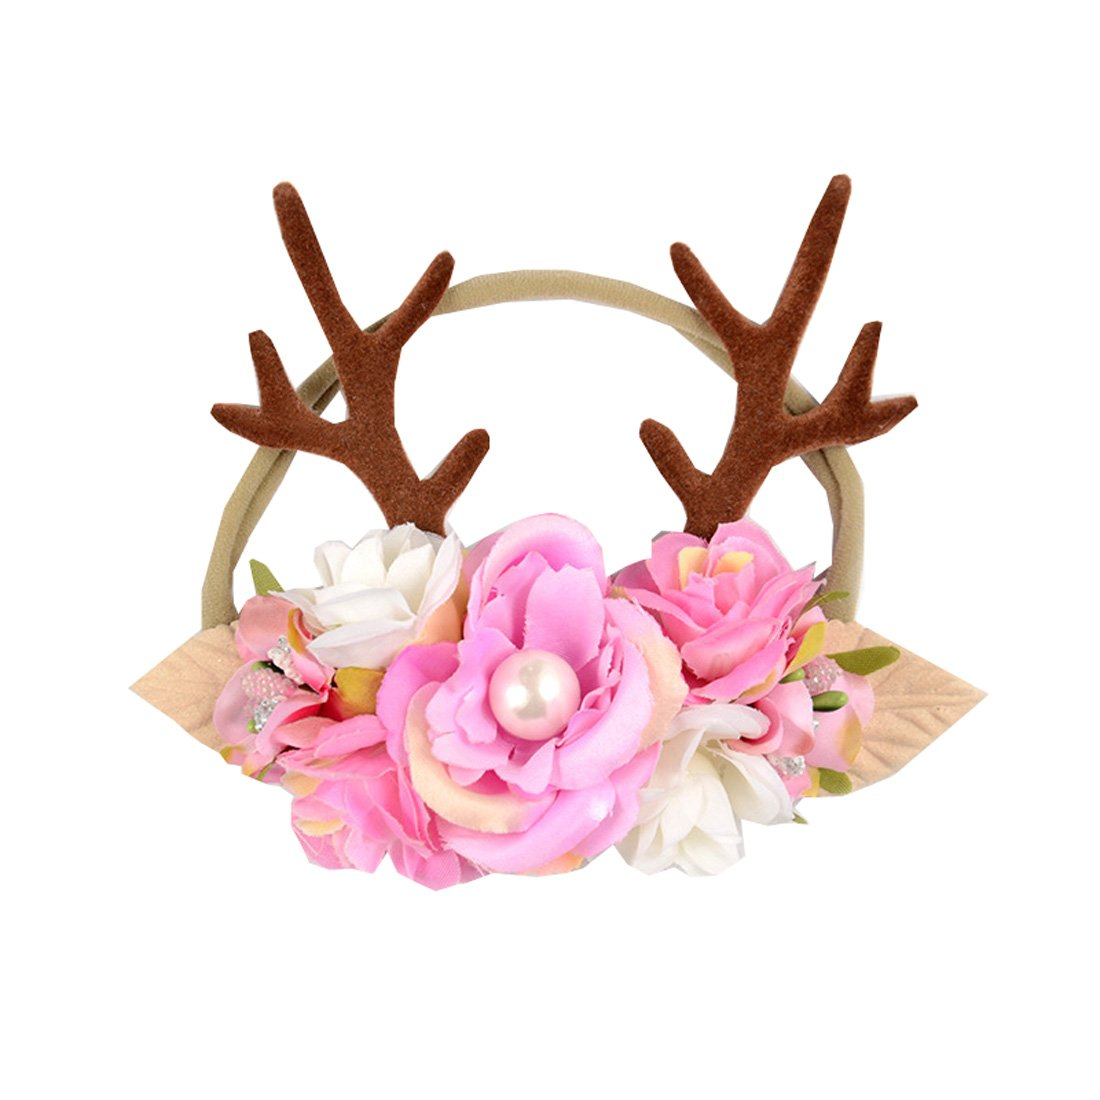 Love Sweety Baby Antler Headband Newborn Rose Floral Crown Wreath Berry Headpiece (Pink)